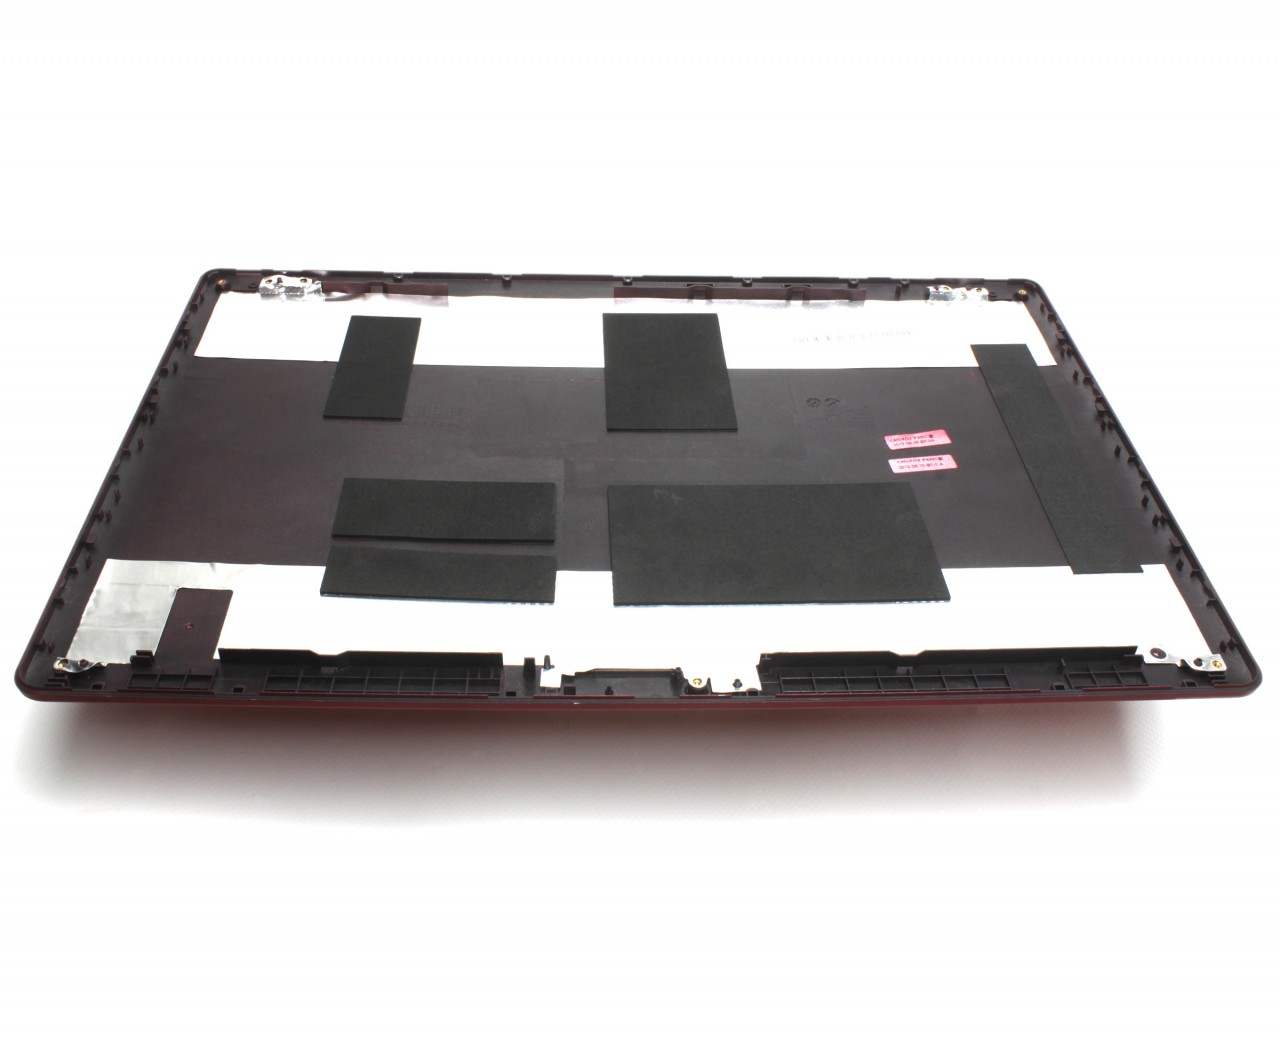 Capac Display BackCover Lenovo ThinkPad Edge E545 Carcasa Display Rosie imagine powerlaptop.ro 2021